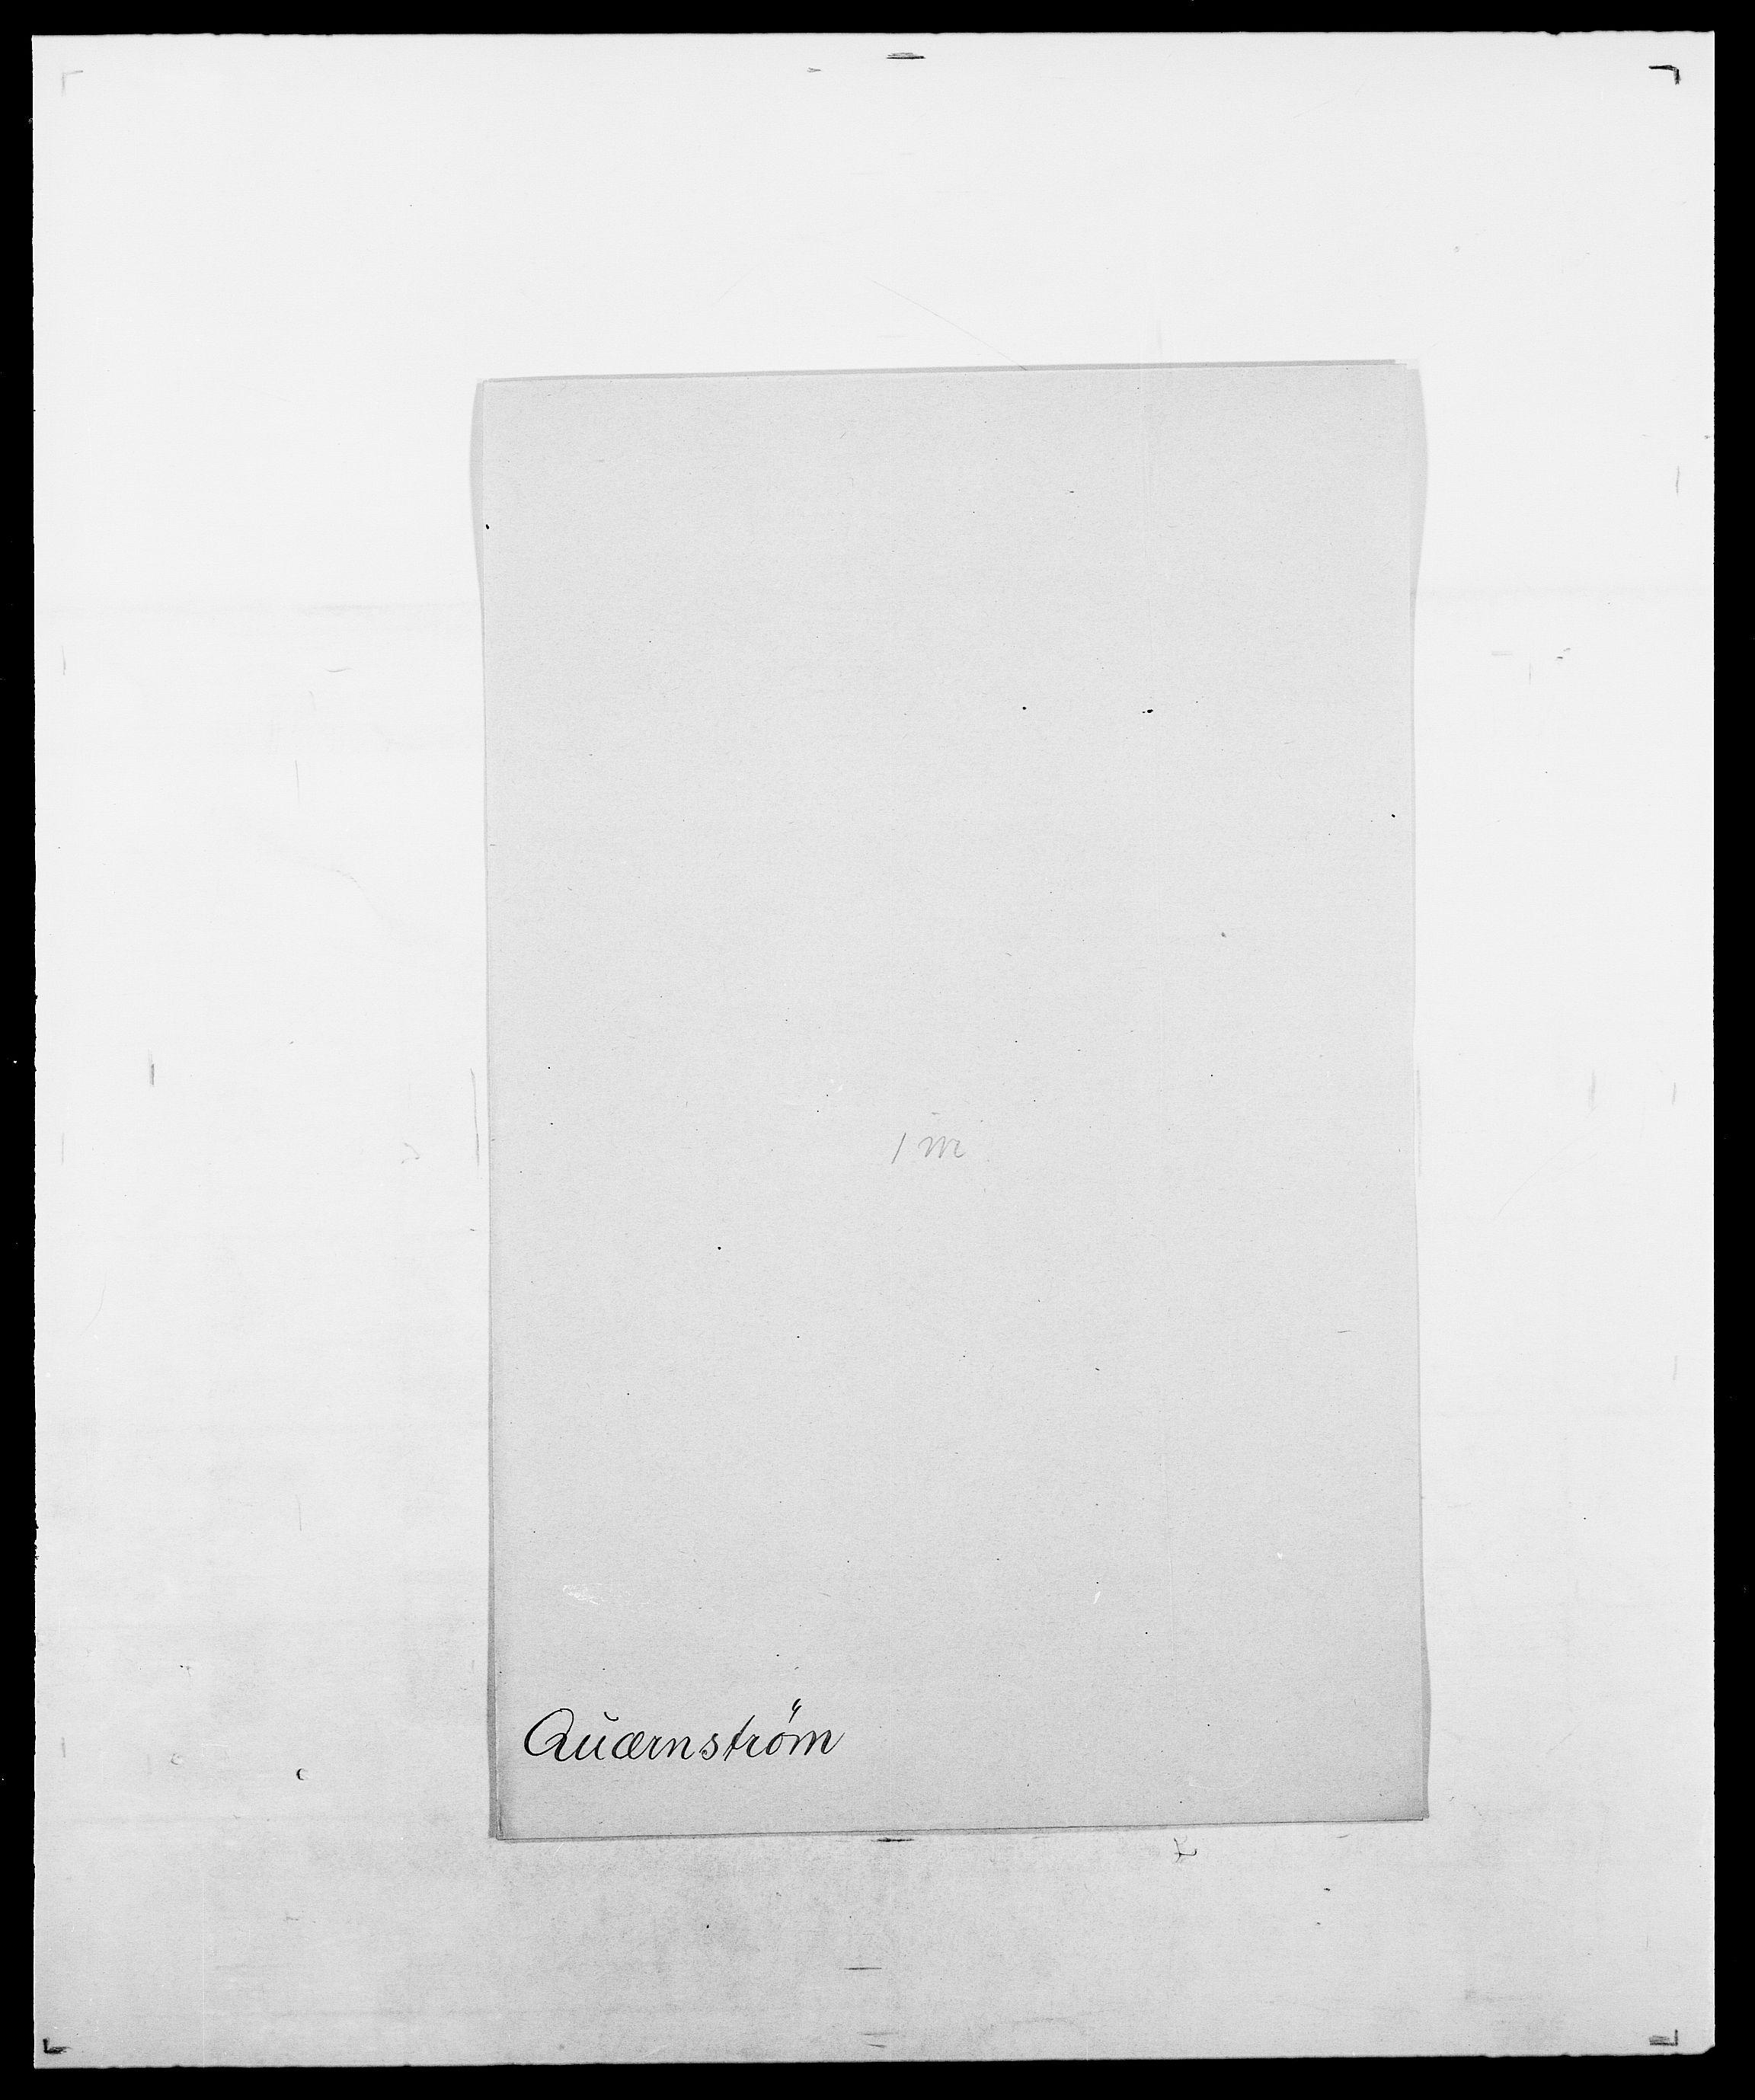 SAO, Delgobe, Charles Antoine - samling, D/Da/L0031: de Place - Raaum, s. 491